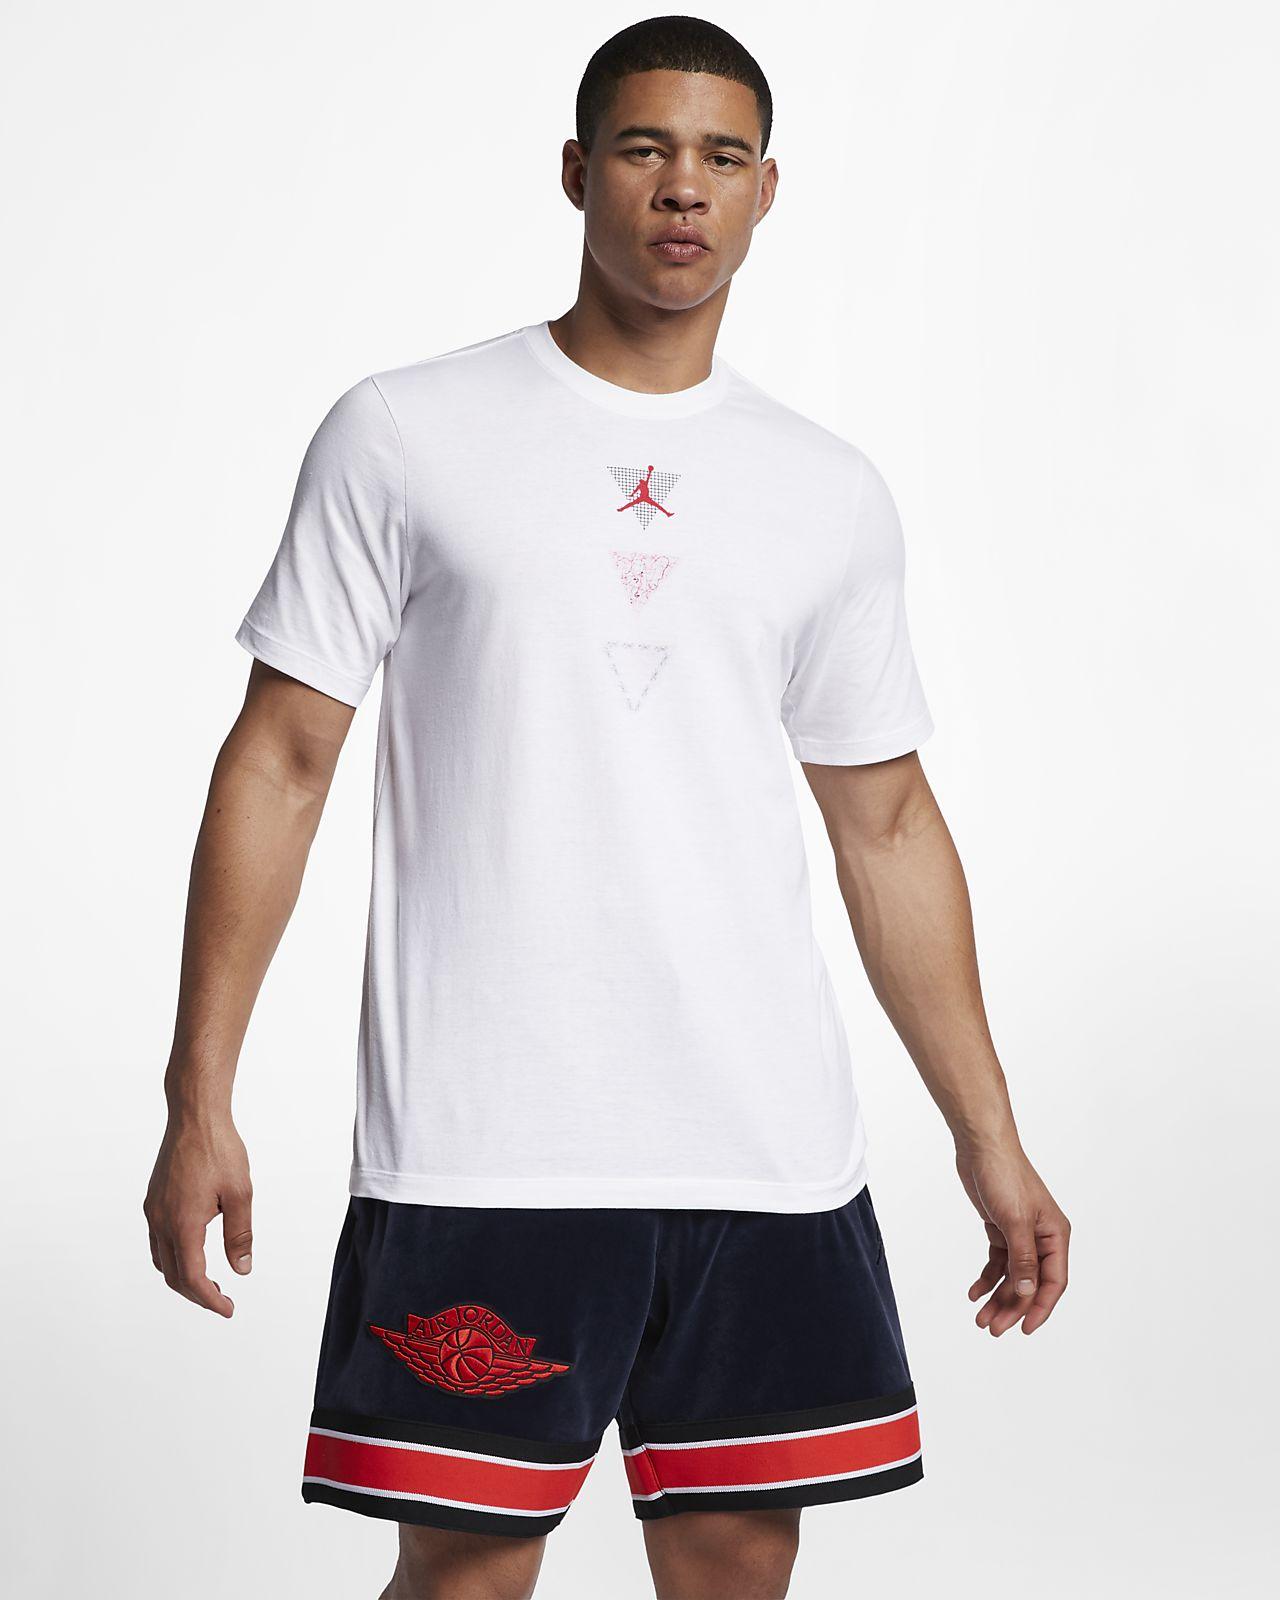 90b016d251 Jordan Legacy AJ4 Men s T-Shirt. Nike.com ID